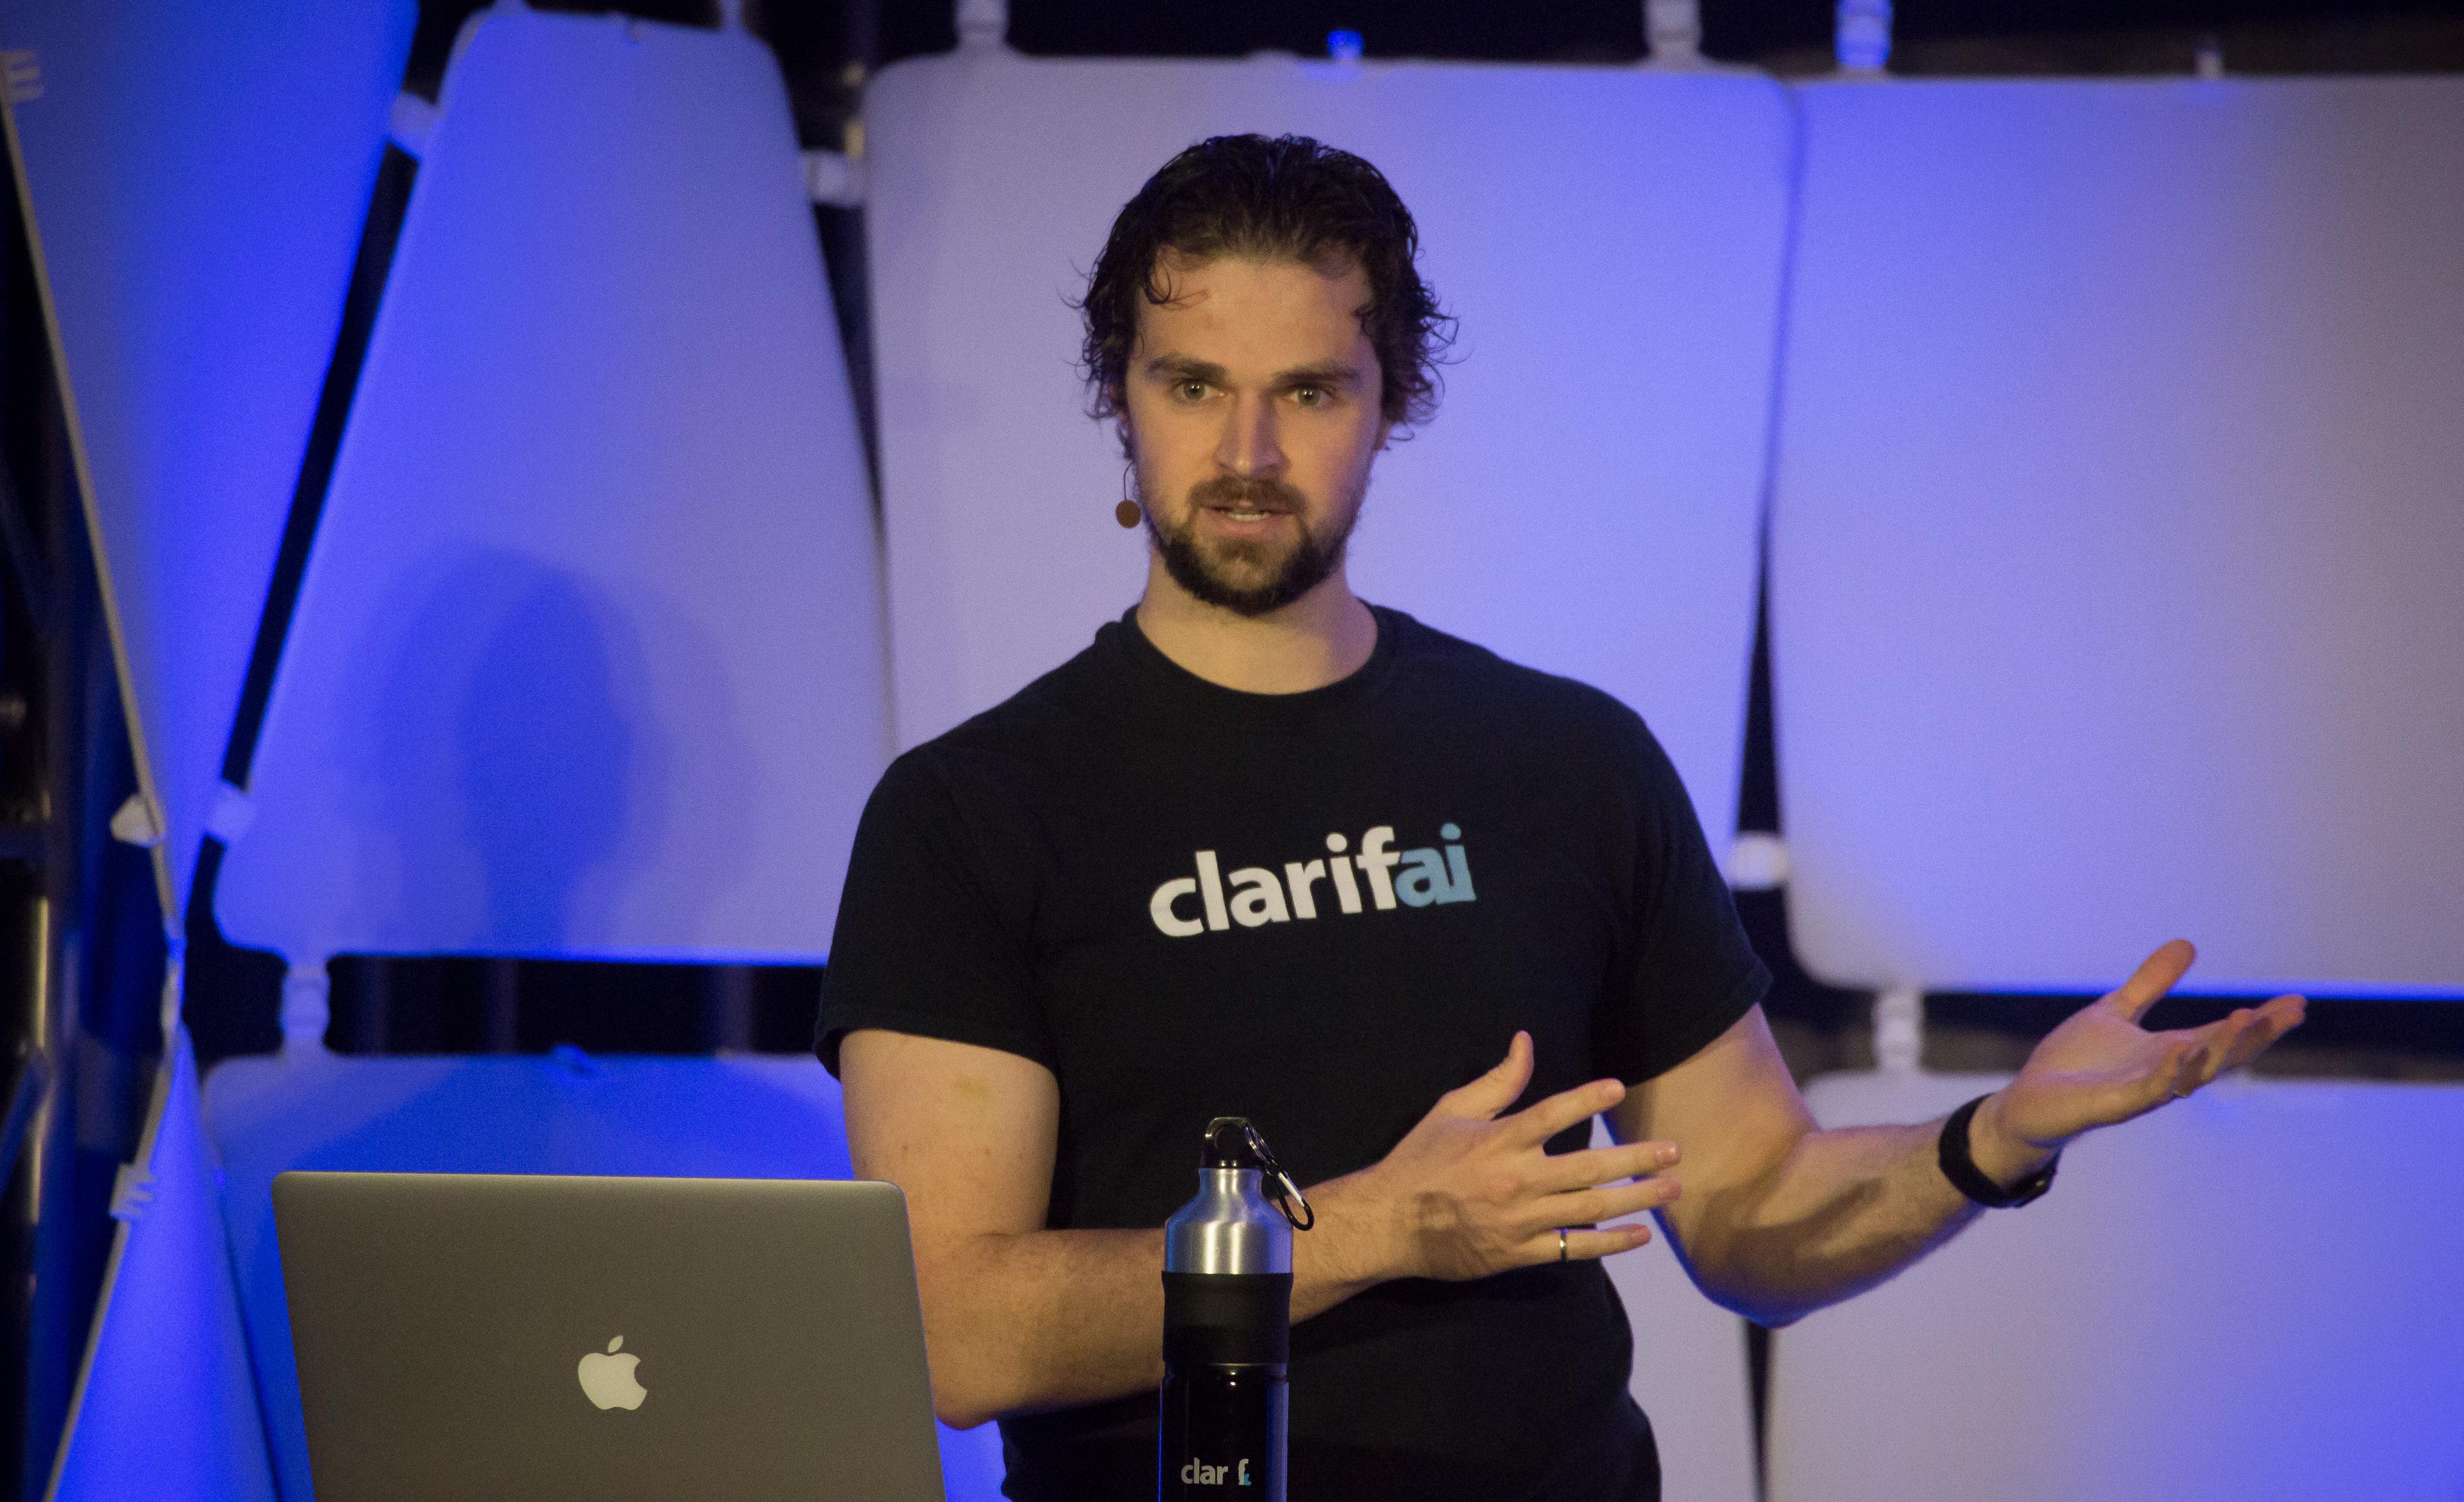 Clarifai CEO Matthew Zeiler at EmTech Digital 2017 in San Francisco.